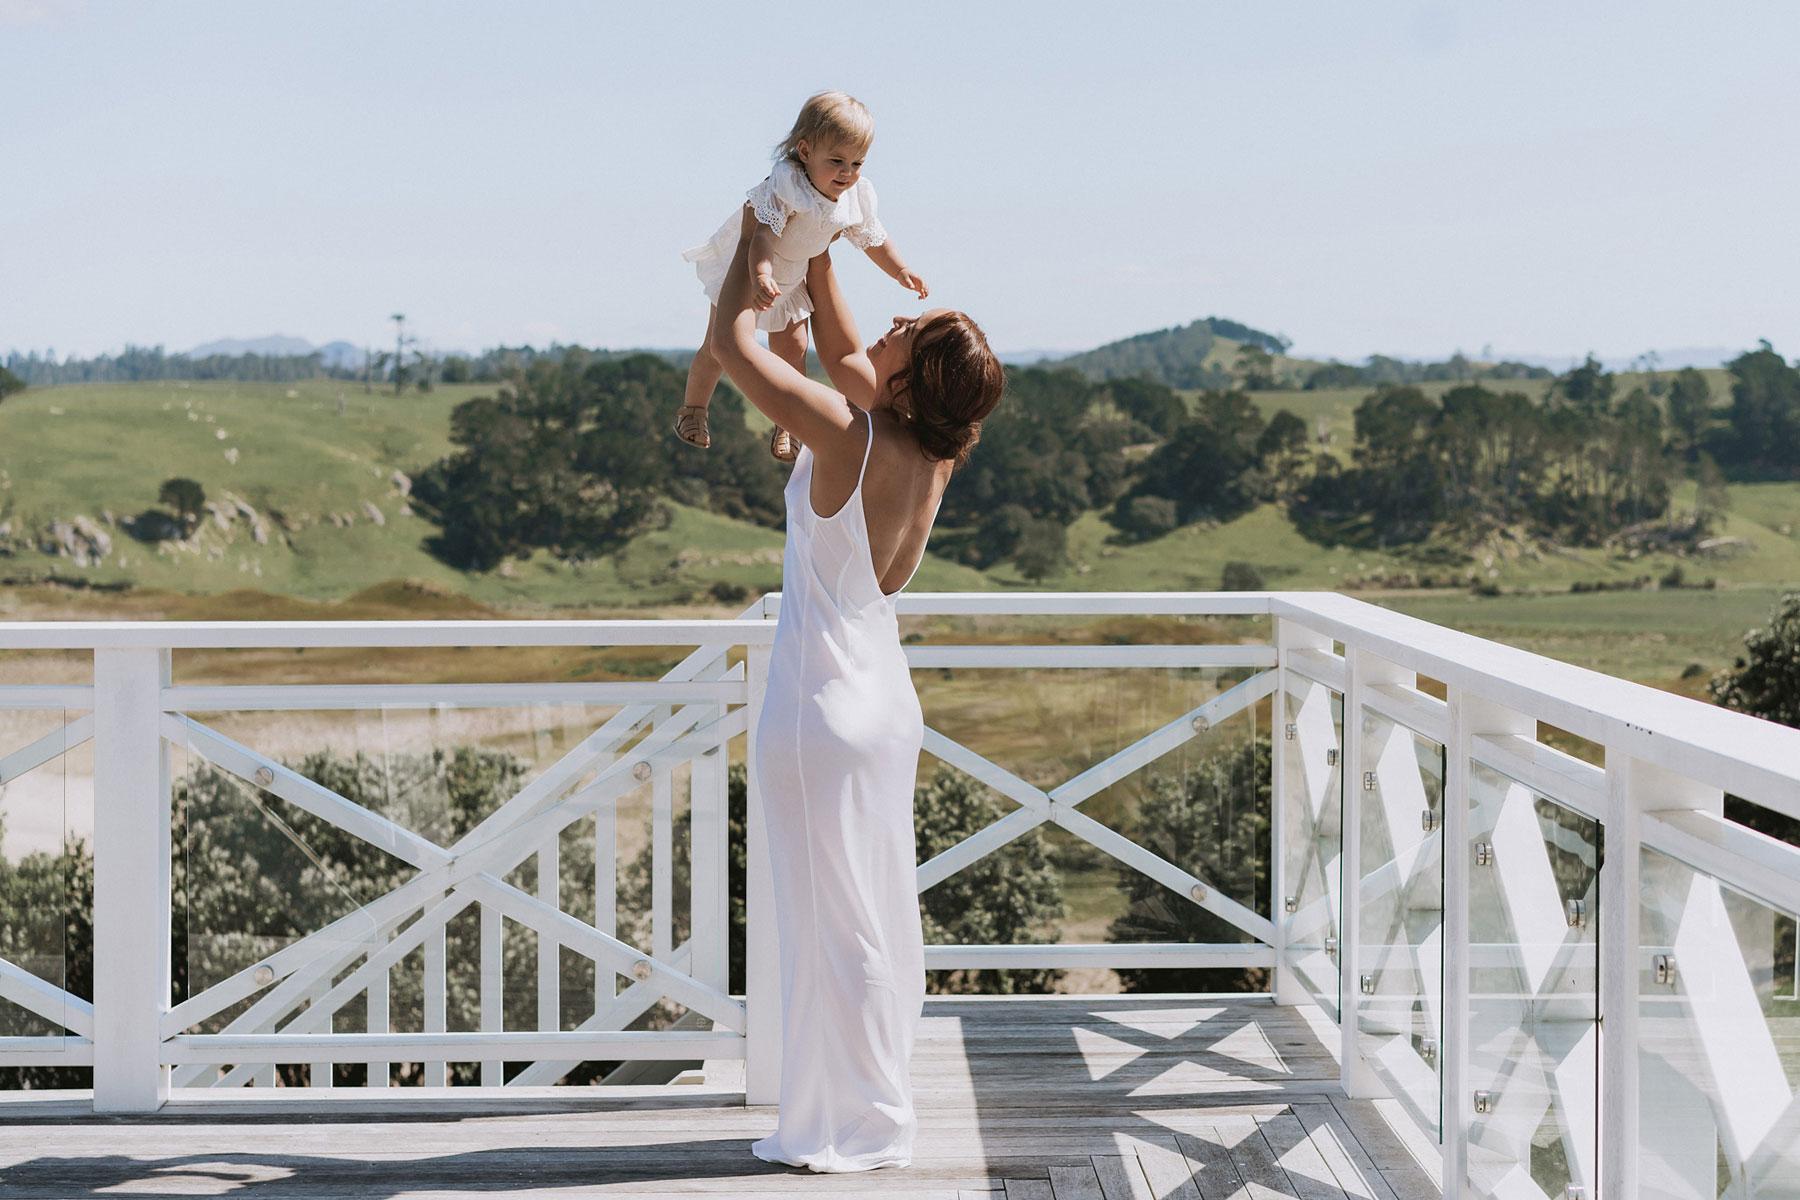 newfound-j-n-orua-beach-house-coromandel-wedding-photographers-151